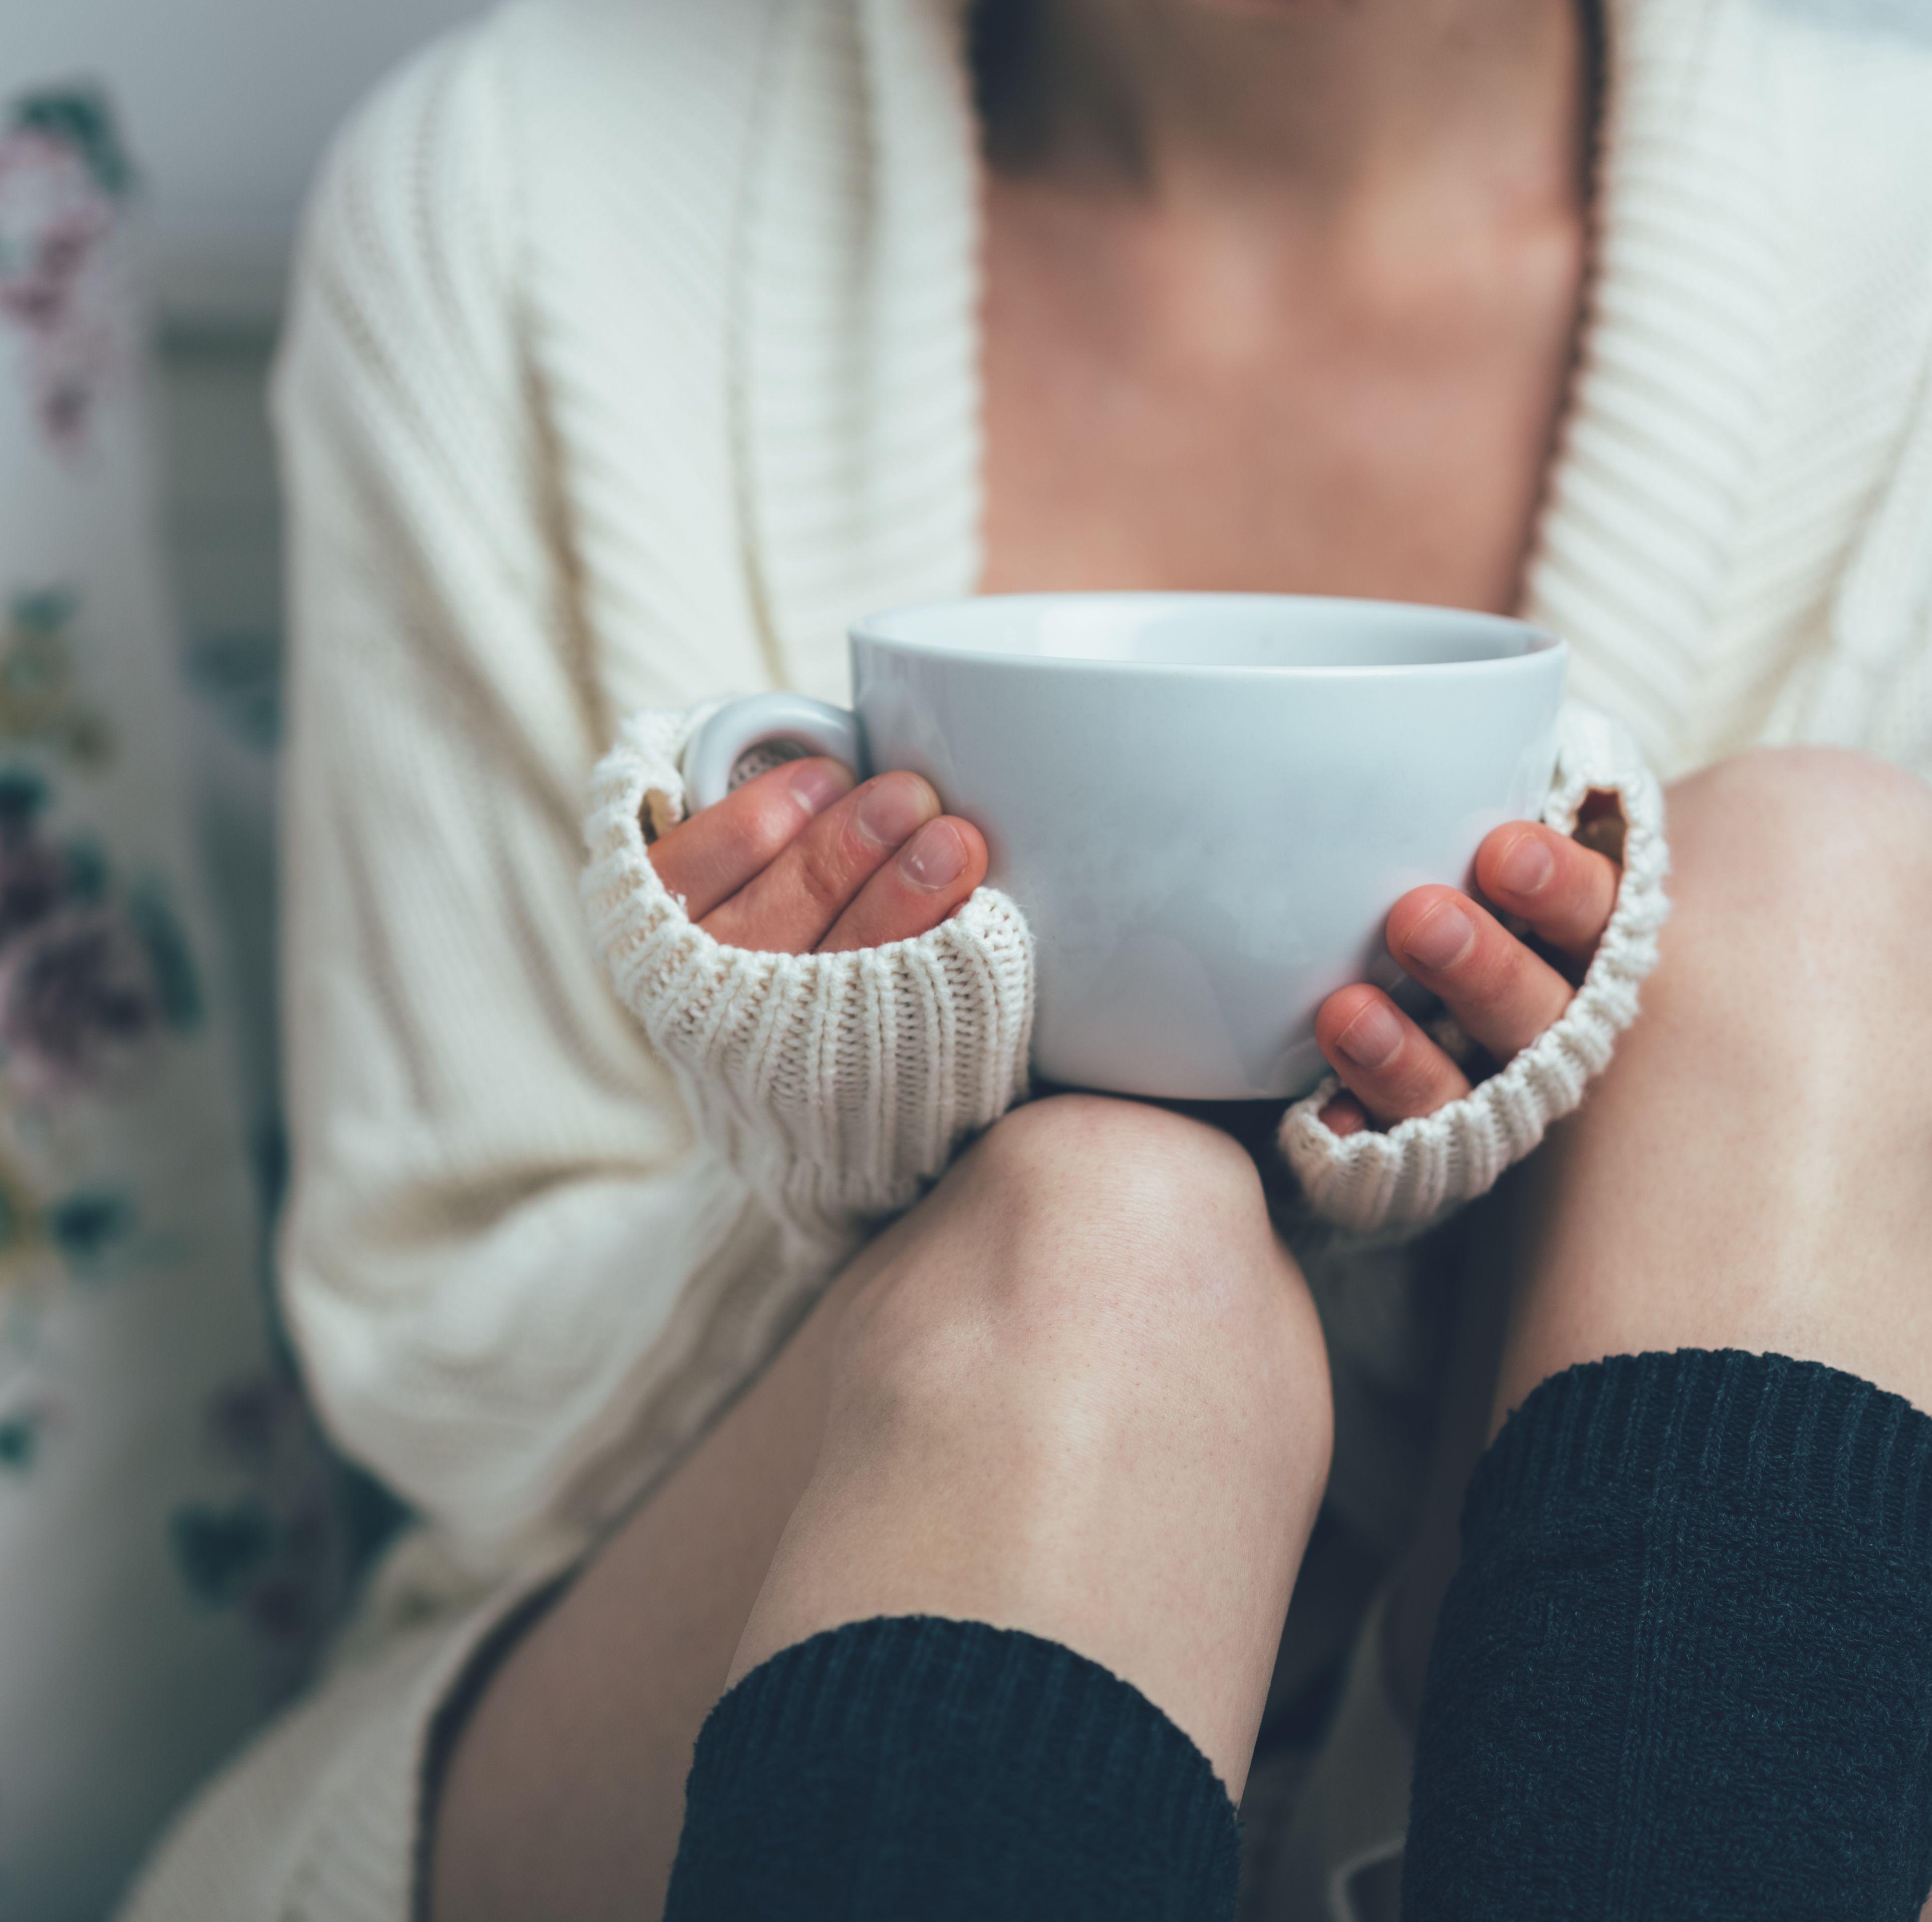 6 Best Teas To Help You Sleep